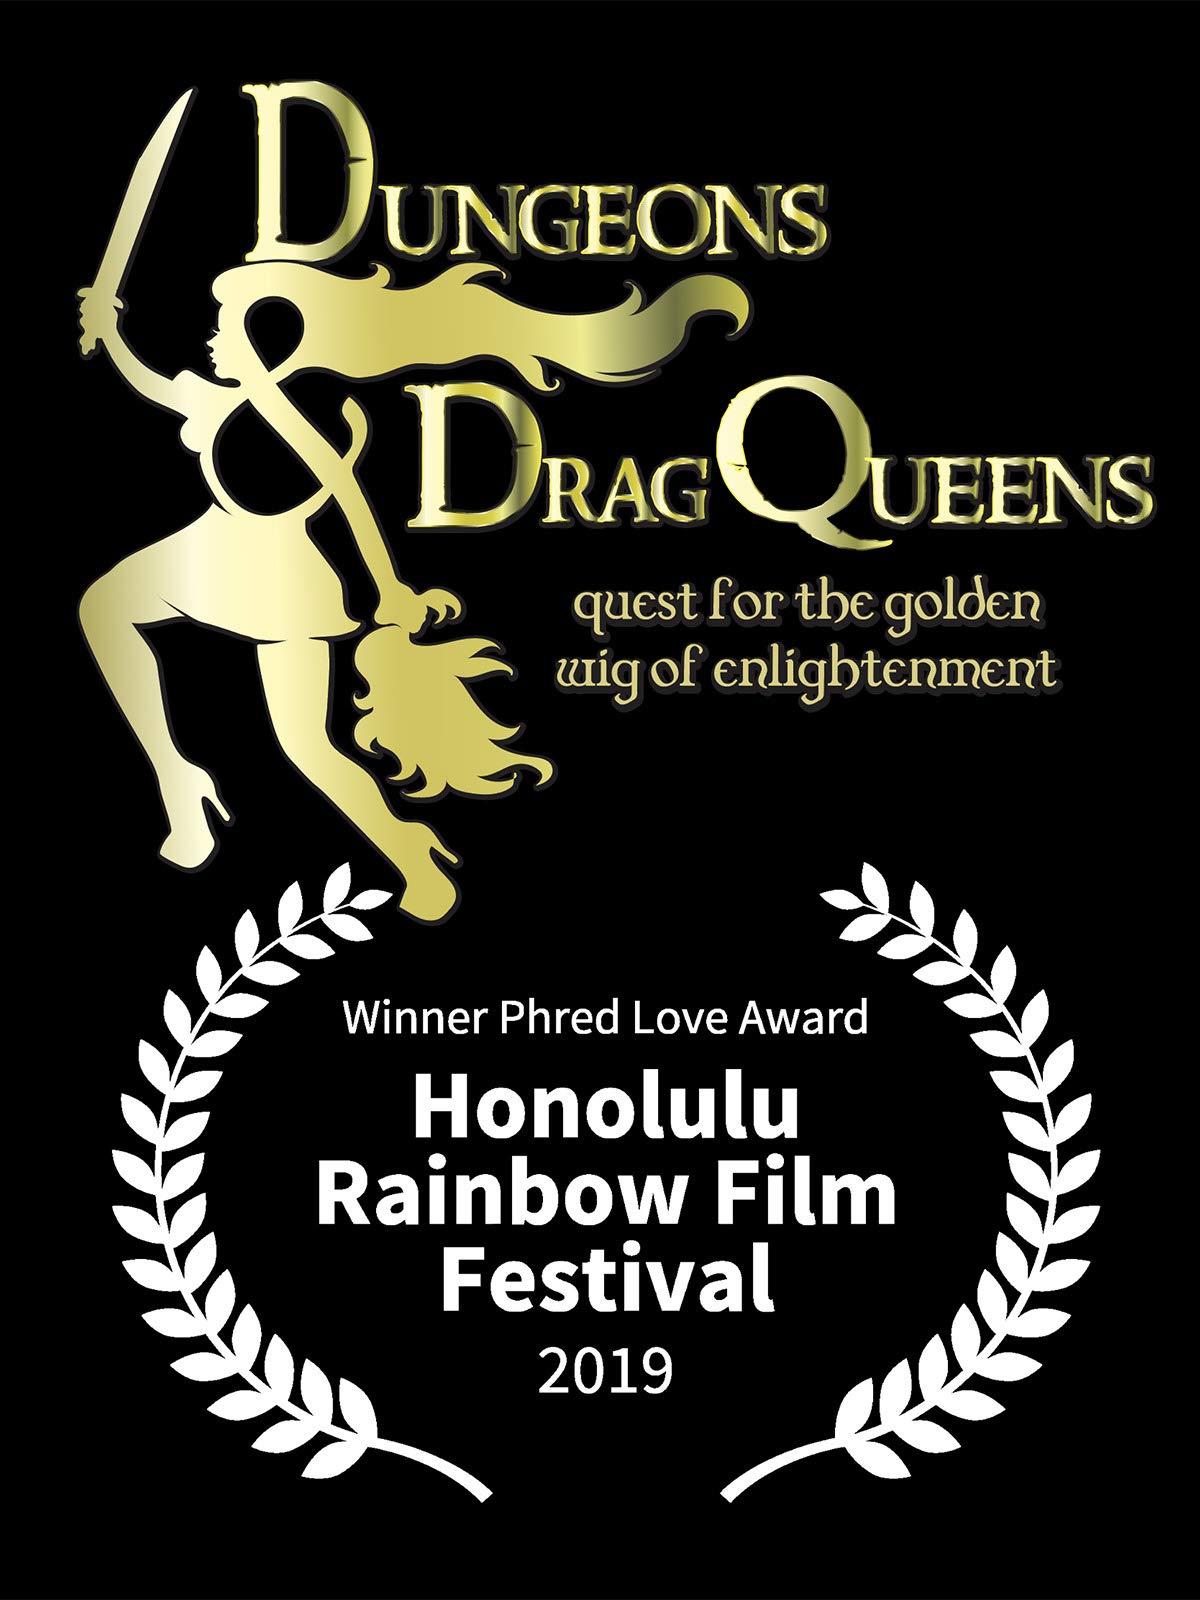 Dungeons & Drag Queens: Quest for the Golden Wig of Enlightenment